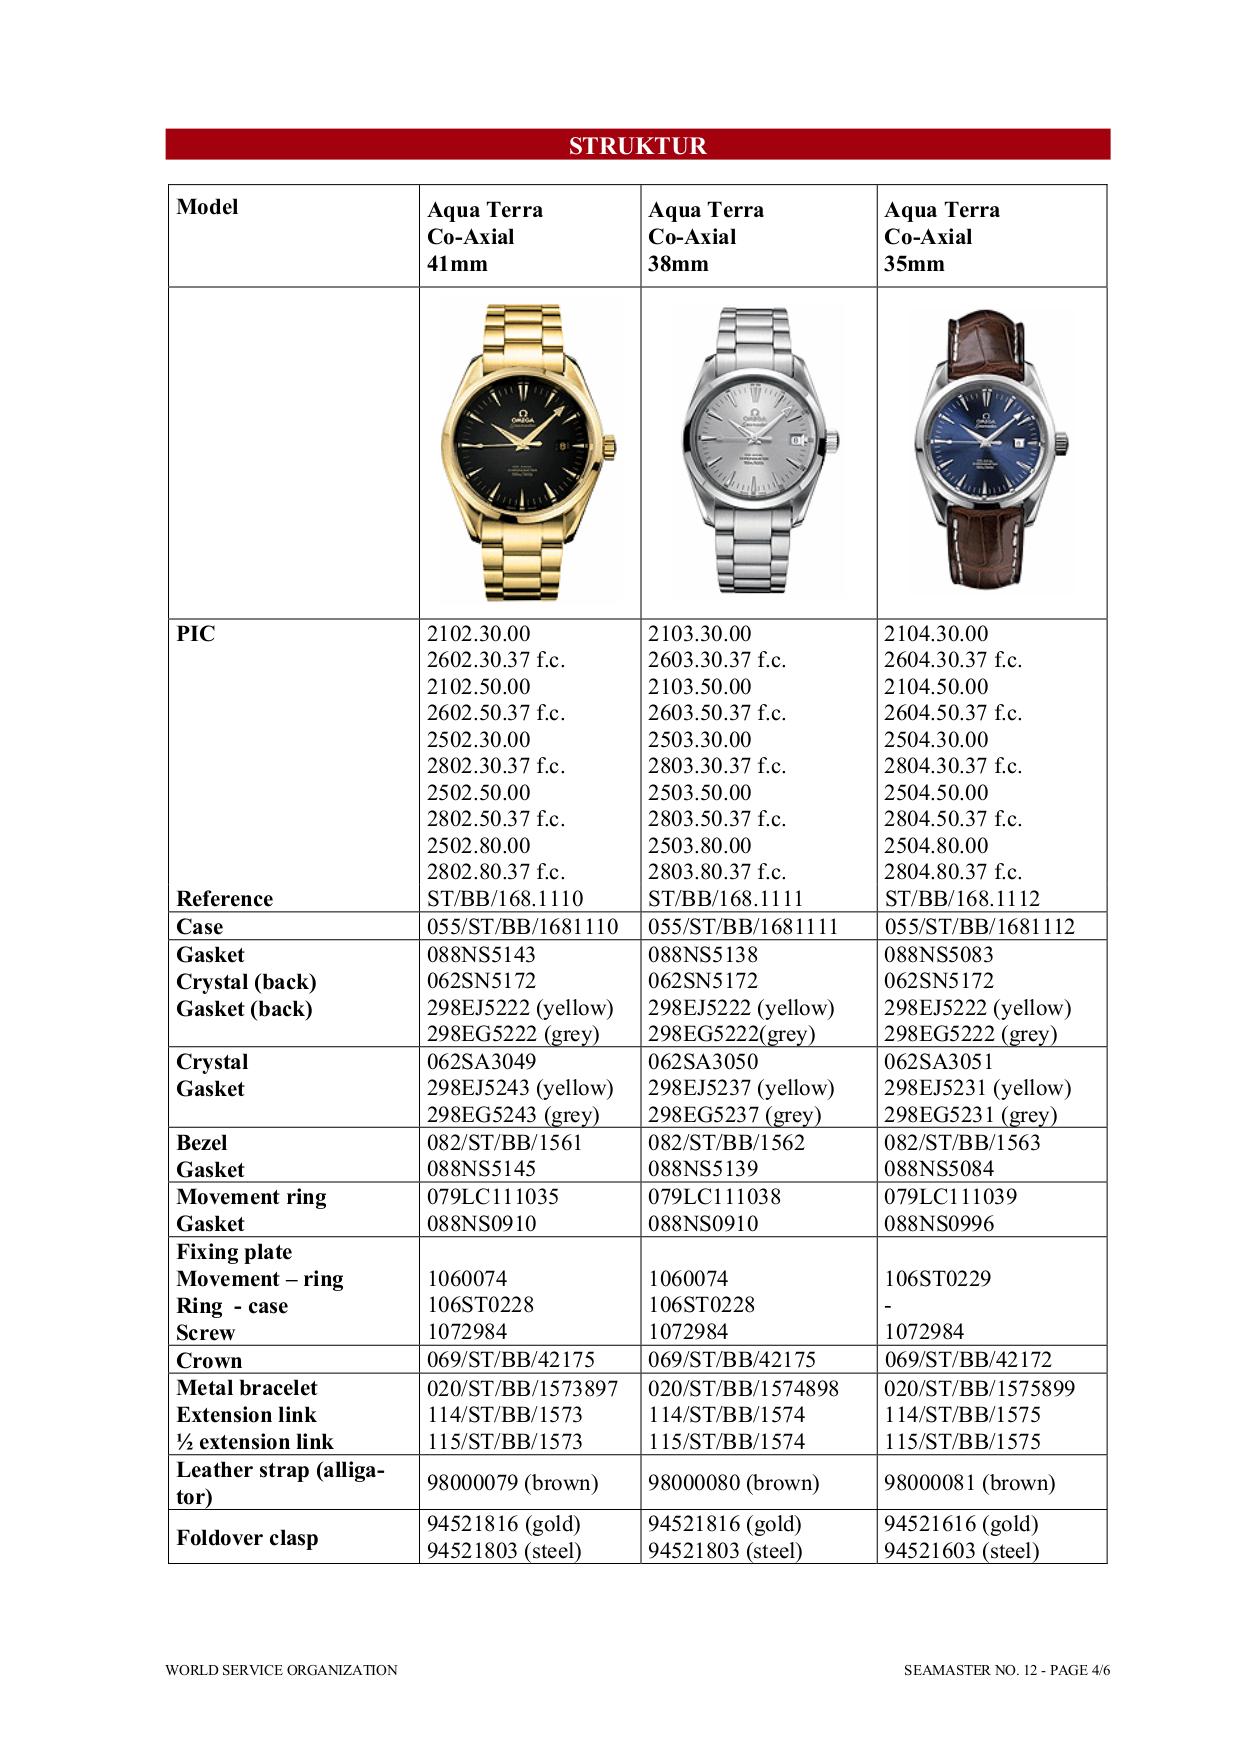 Pdf Manual For Omega Watch Seamaster 25775000